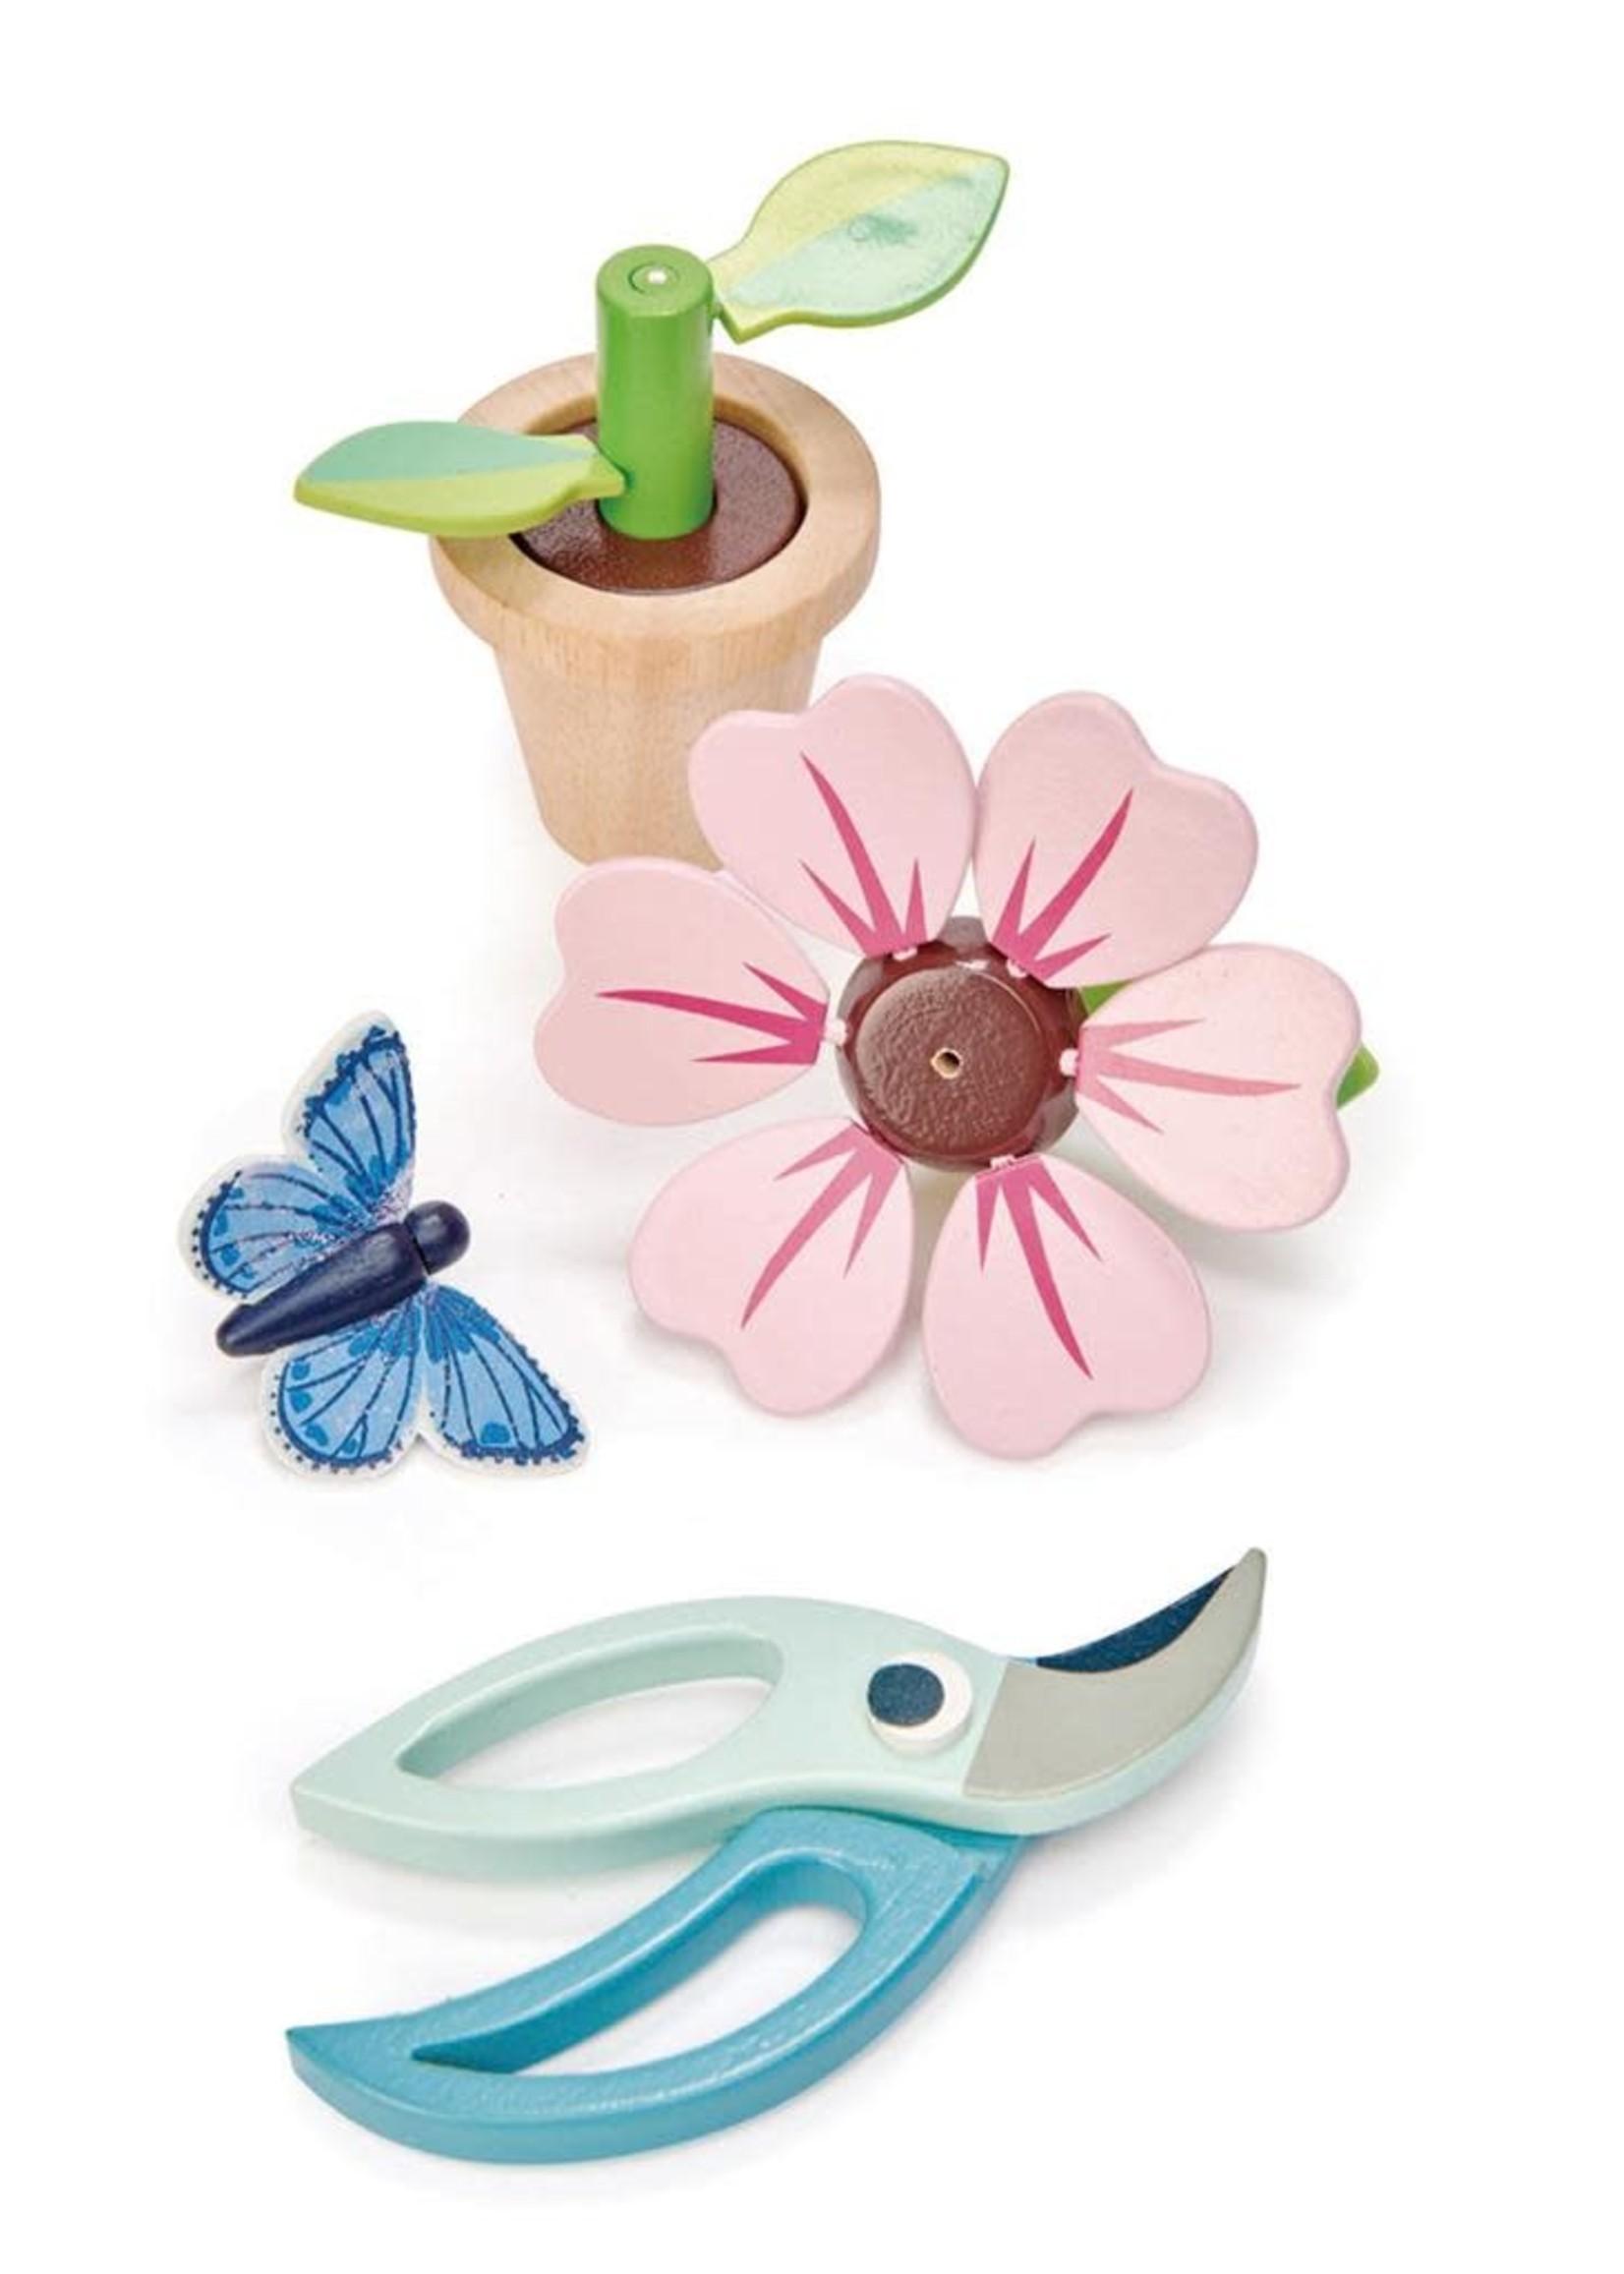 Tender Leaf Toys Bloempot bloemen